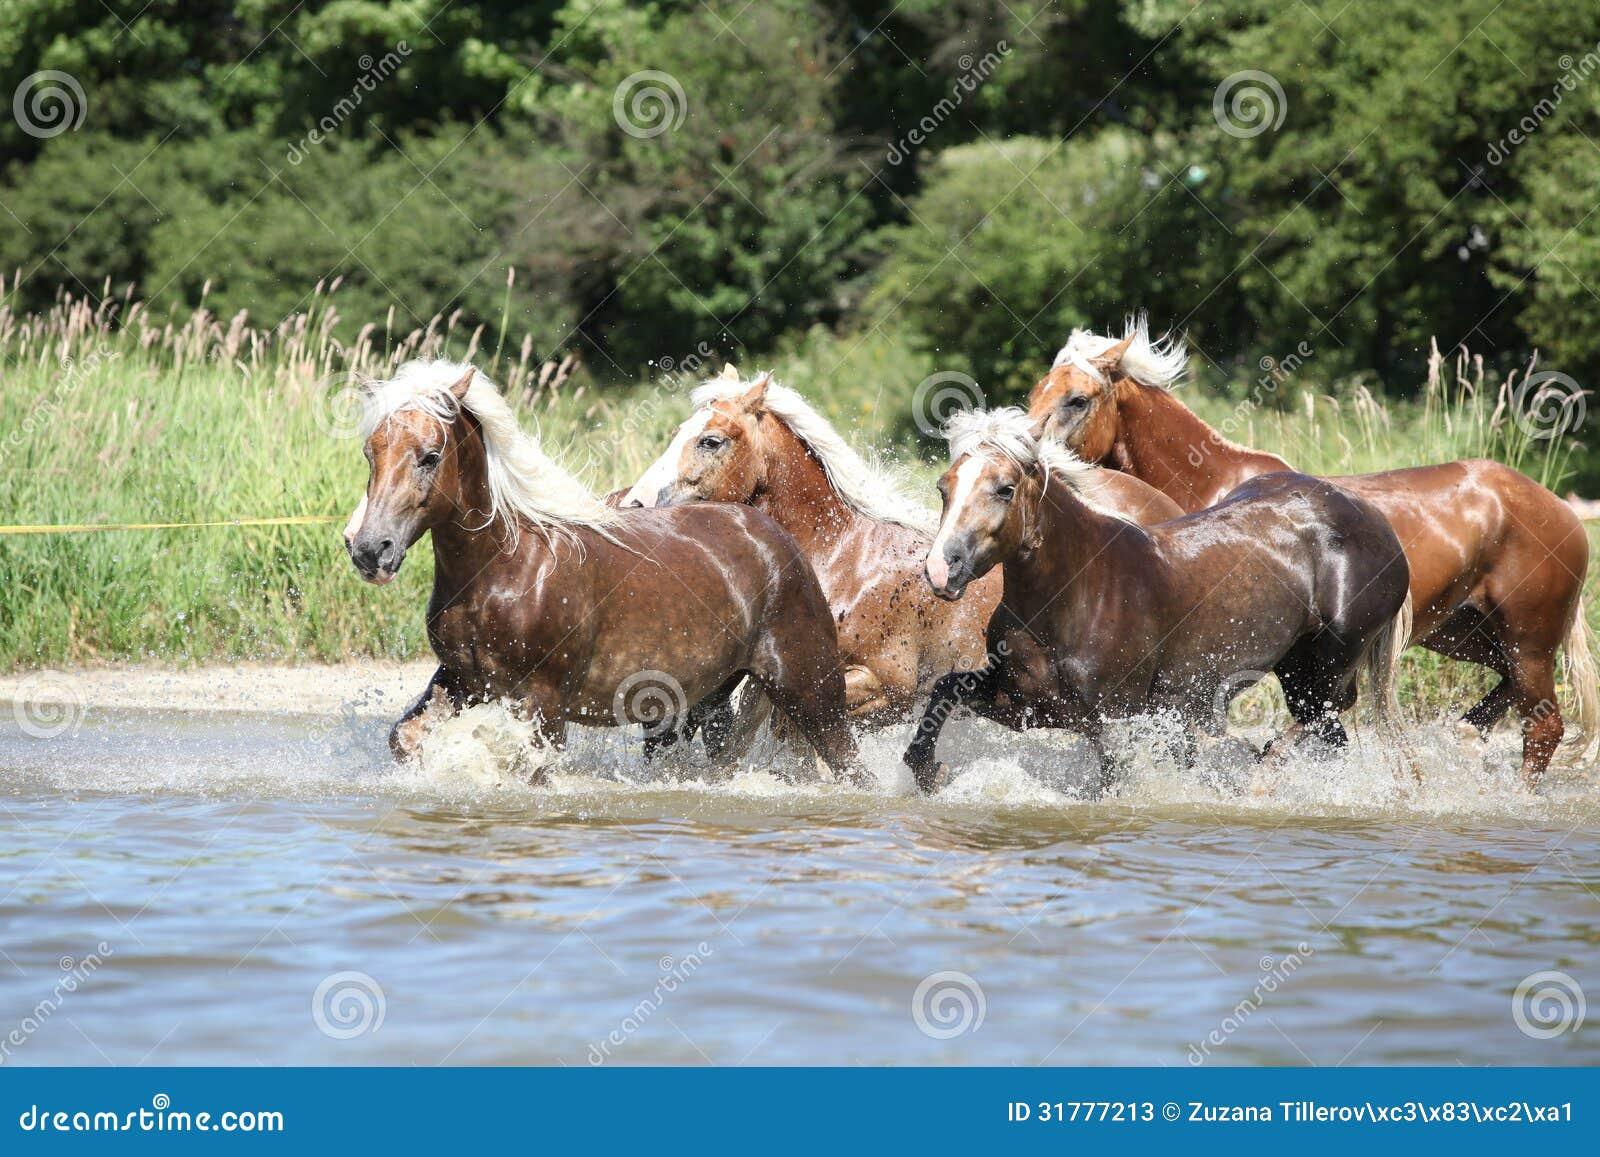 bdo how to catch a wild horse